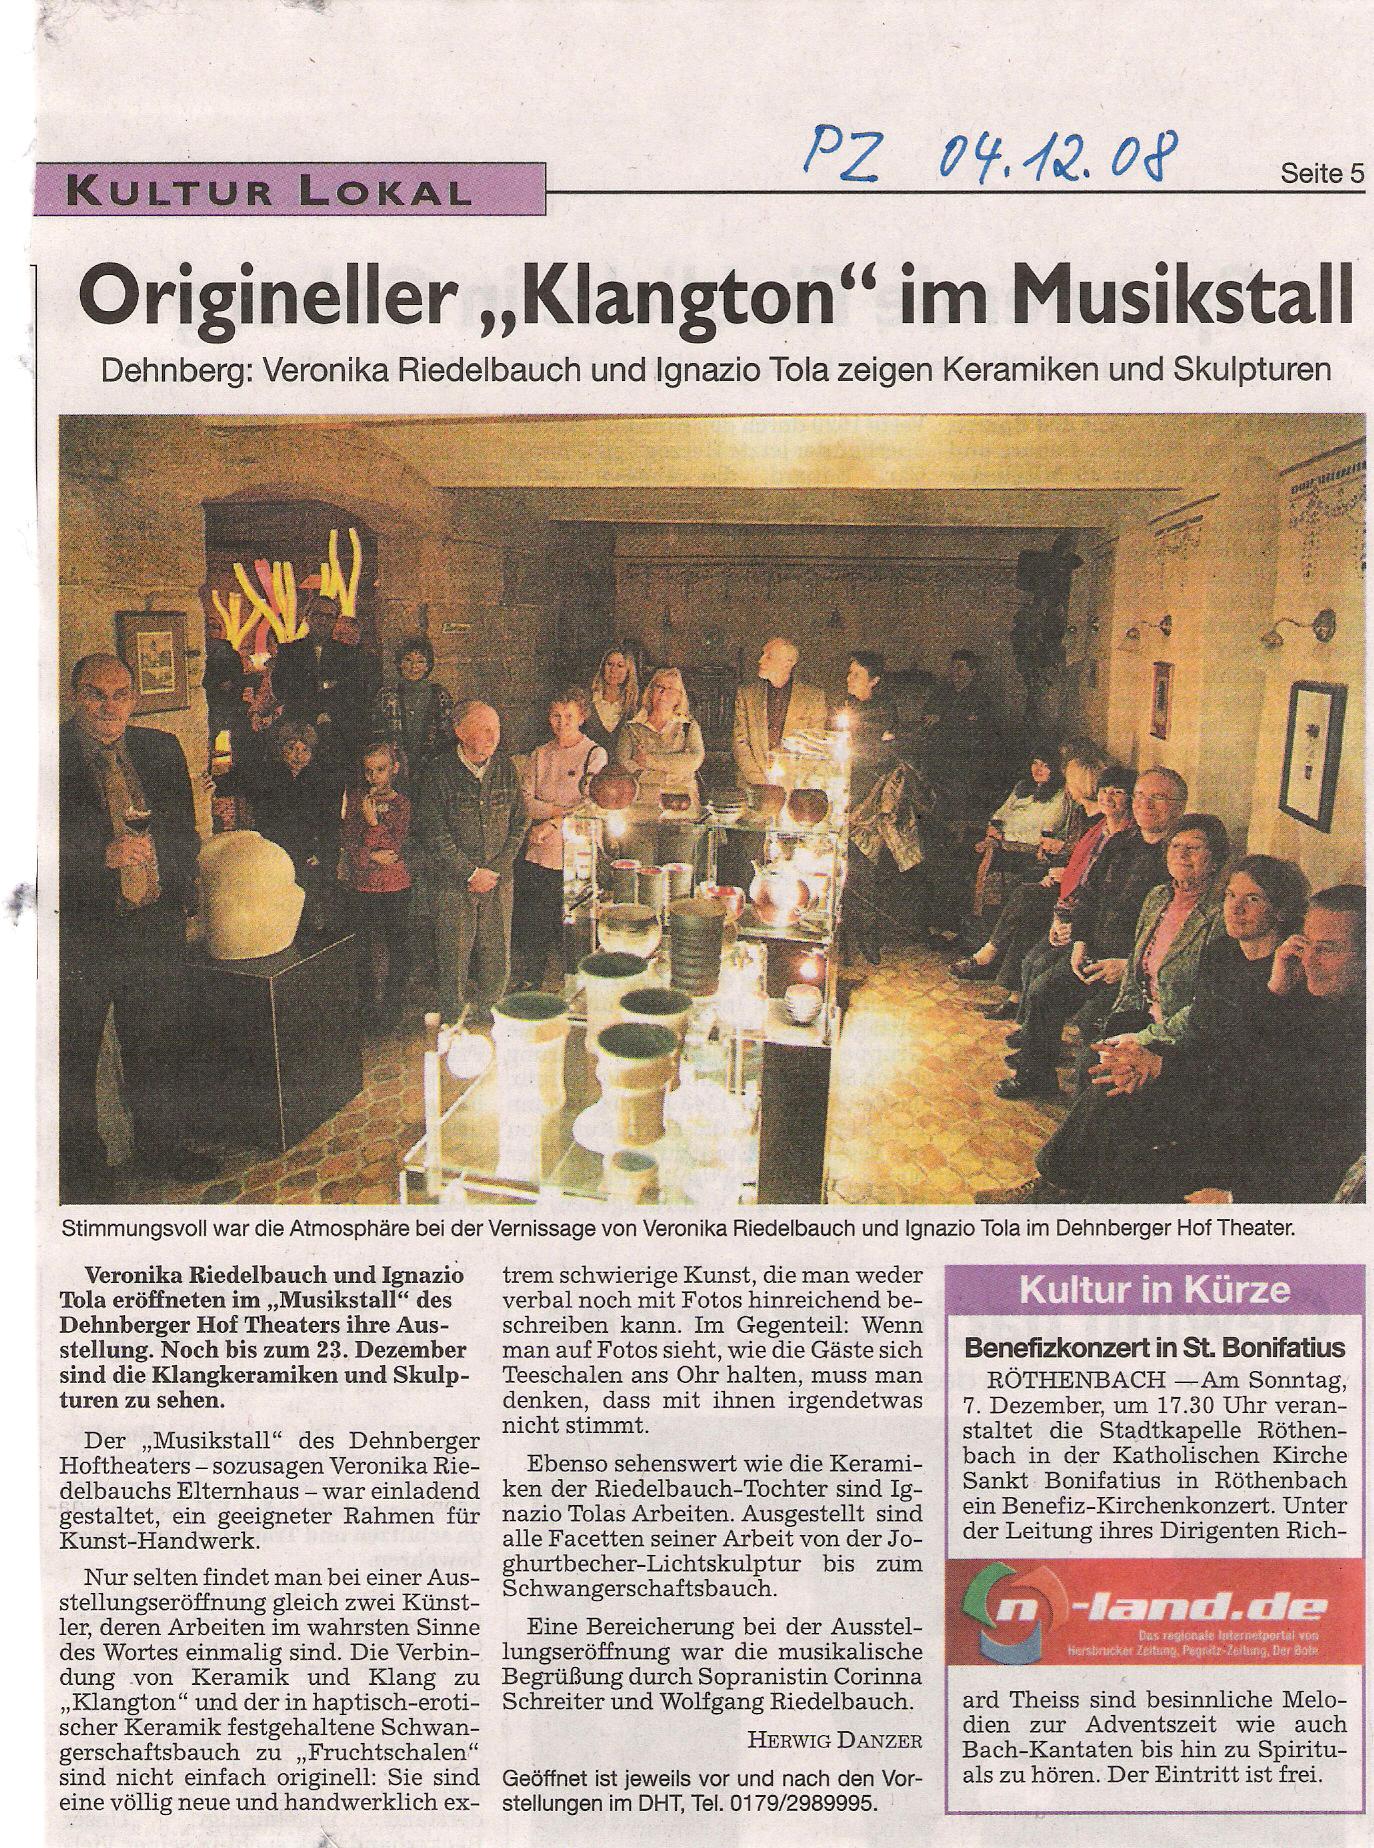 Ausstellung im Dehnberger Hof Theater